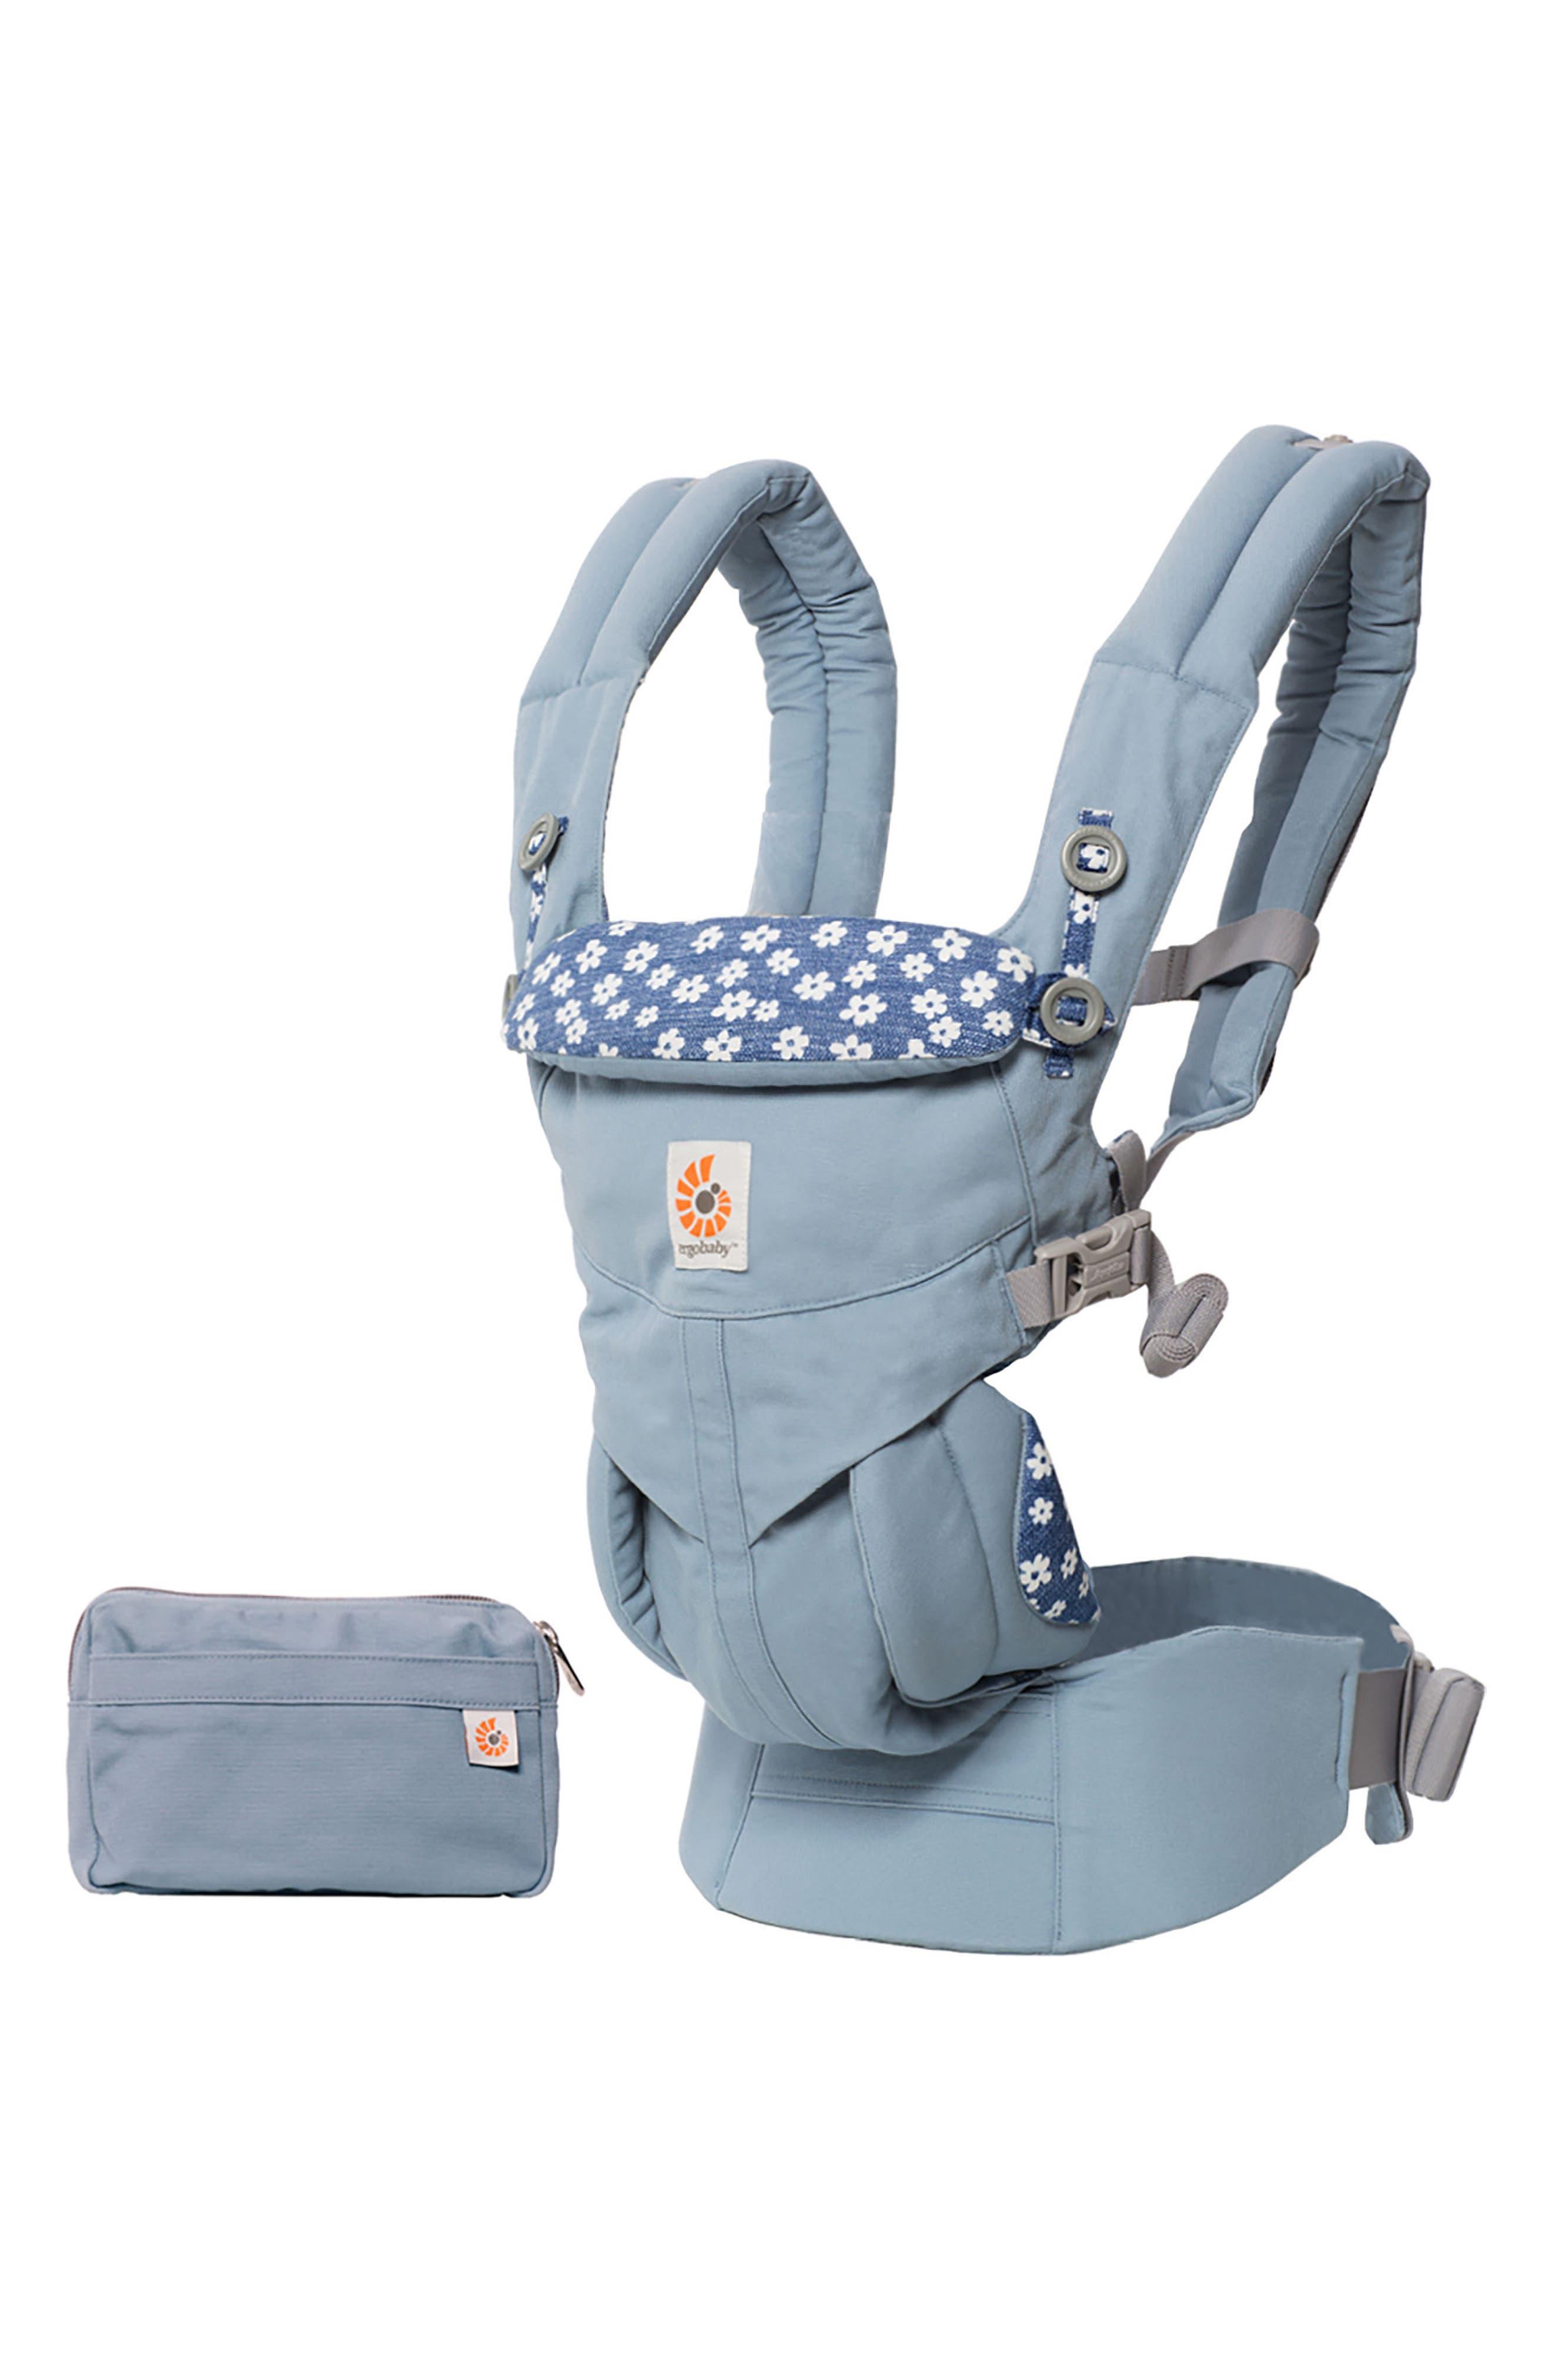 ERGObaby Omni 360 Daisy Print Baby Carrier